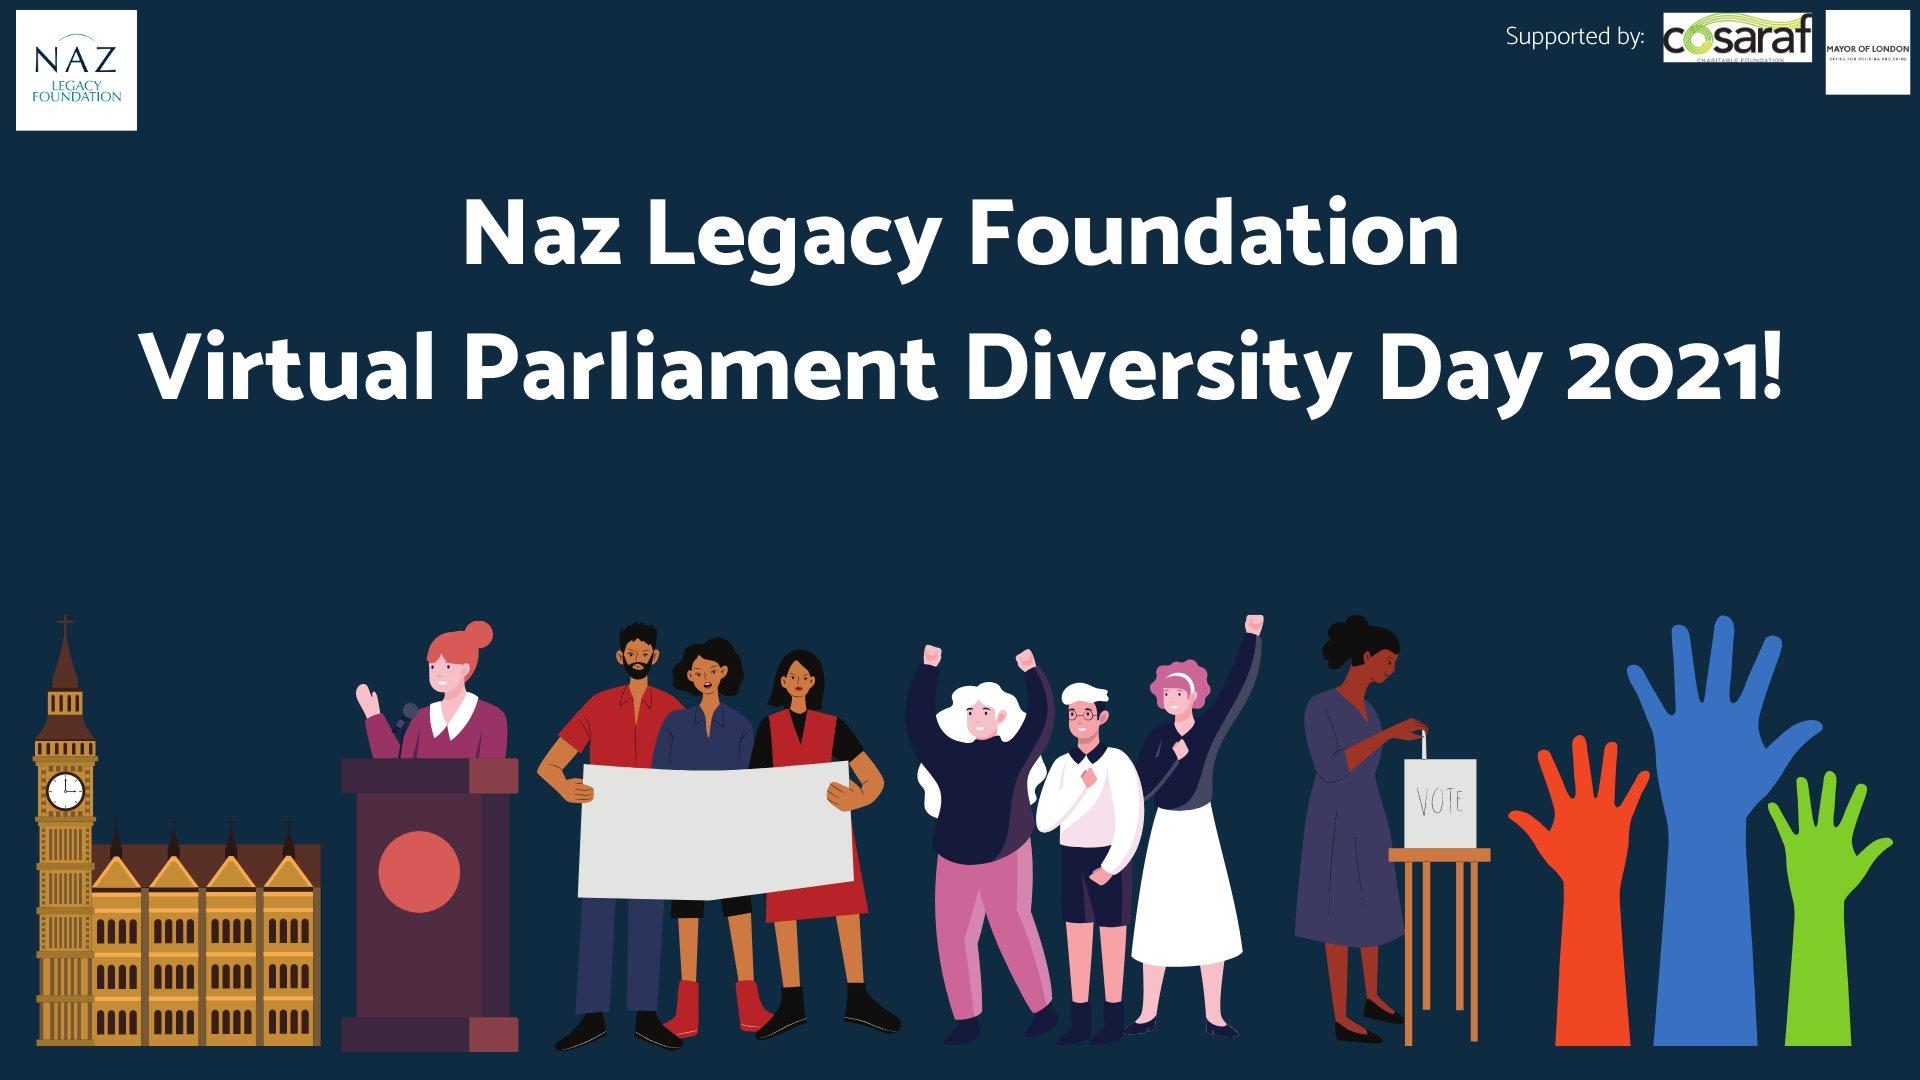 Diversity Day: Parliament